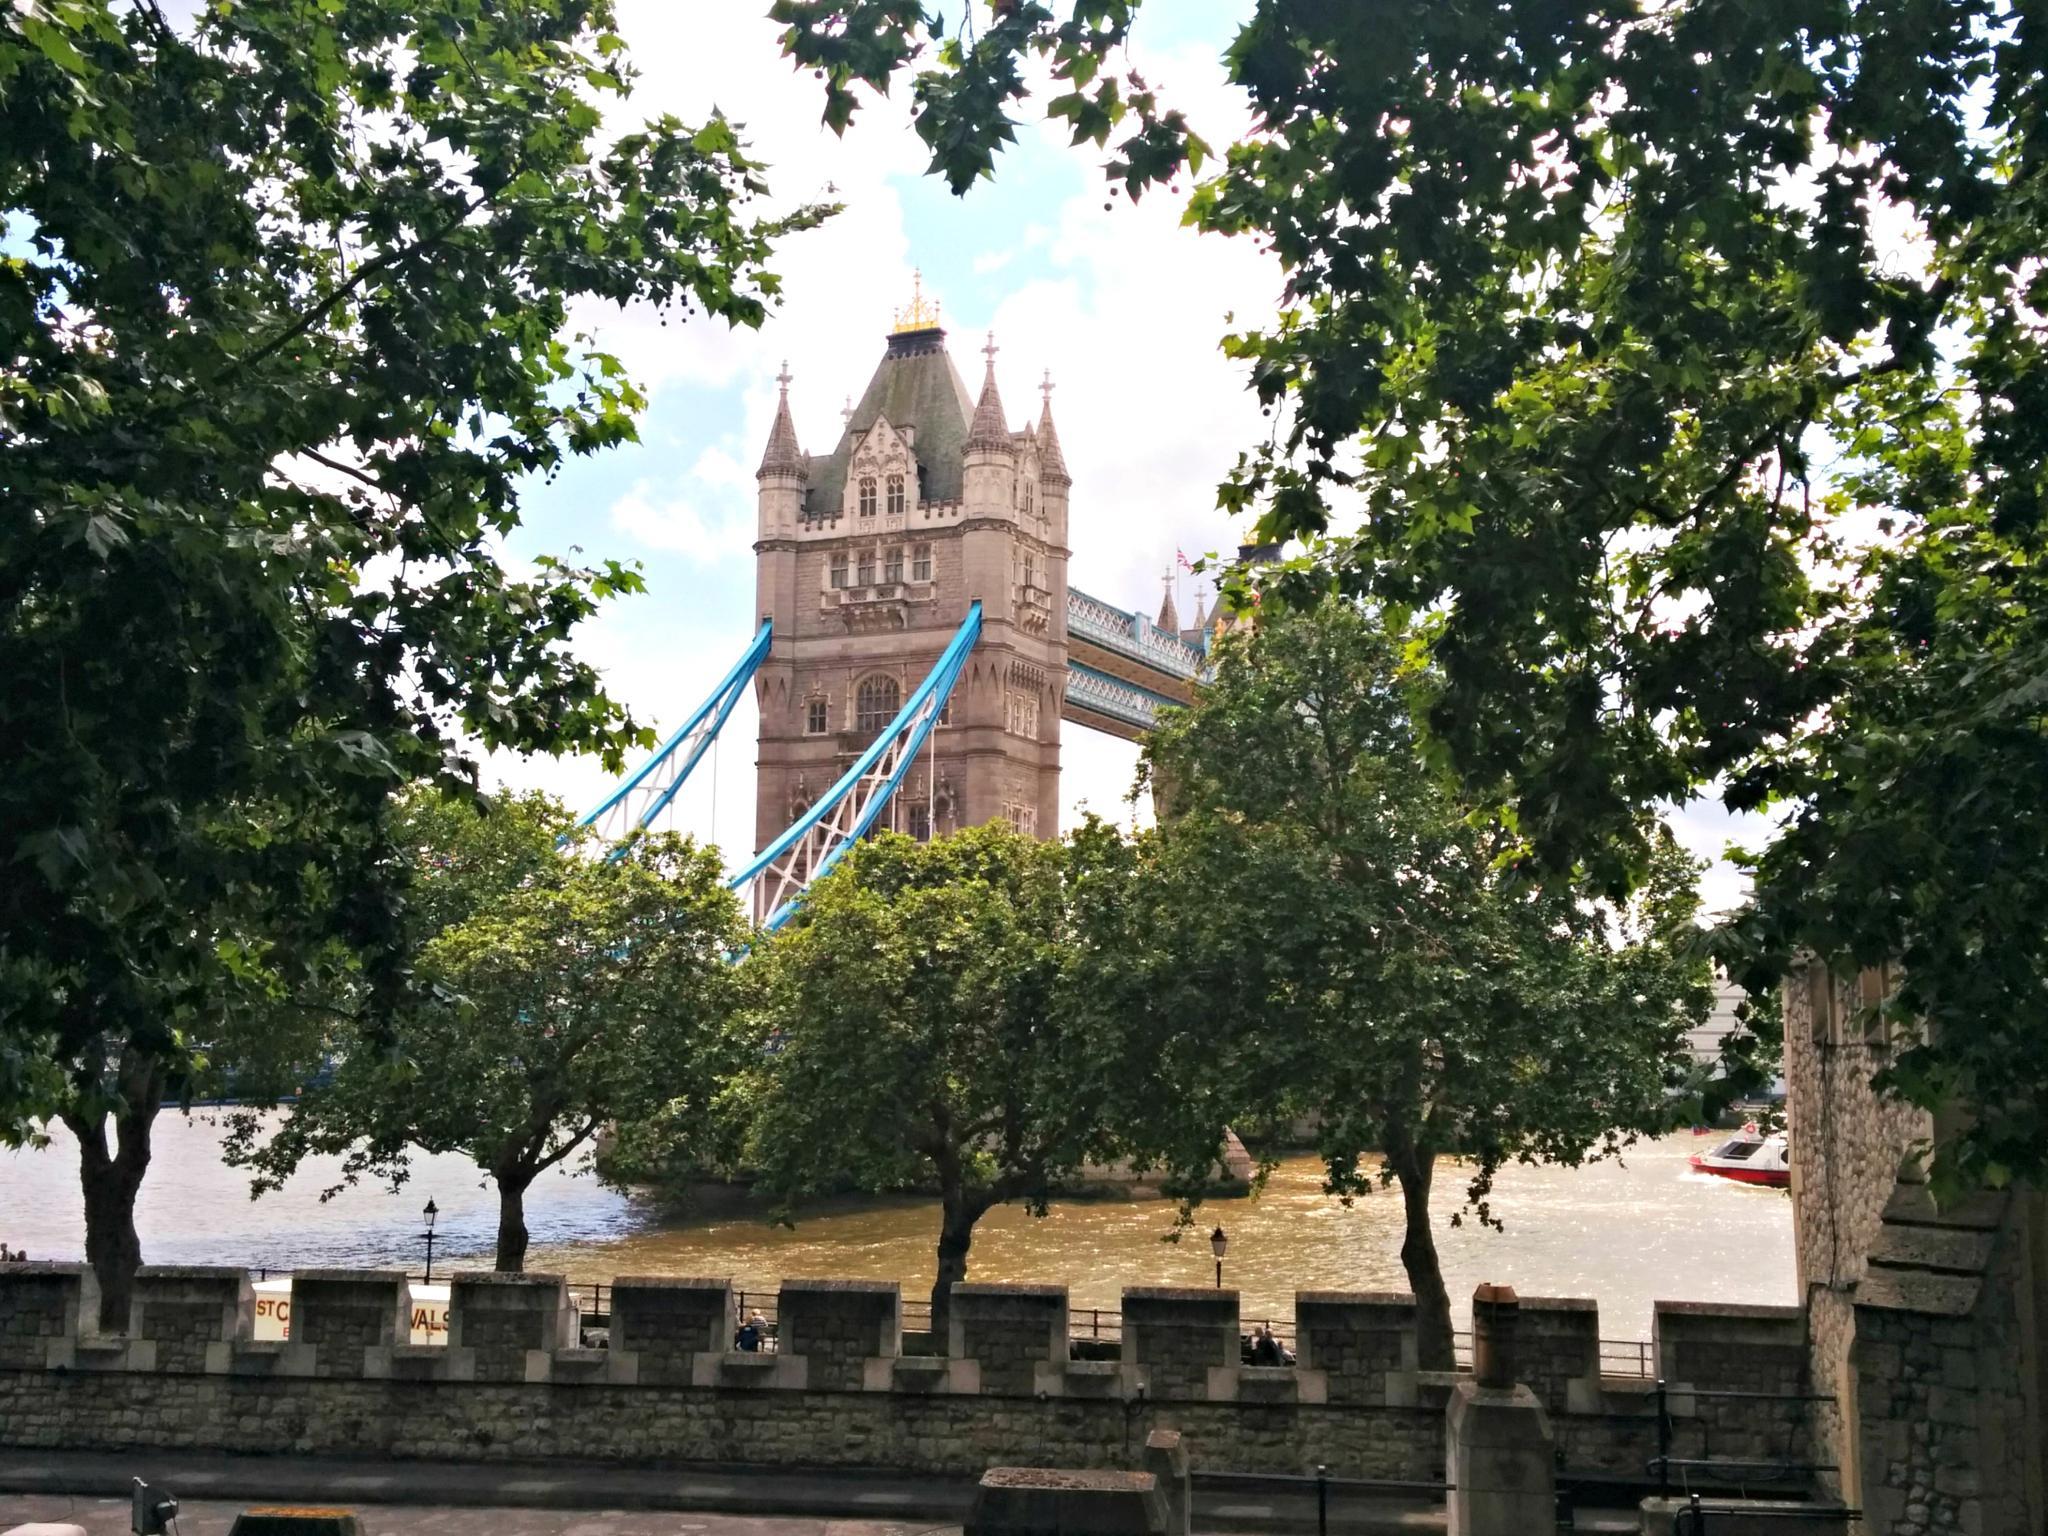 Tower Bridge, London by sam medzic